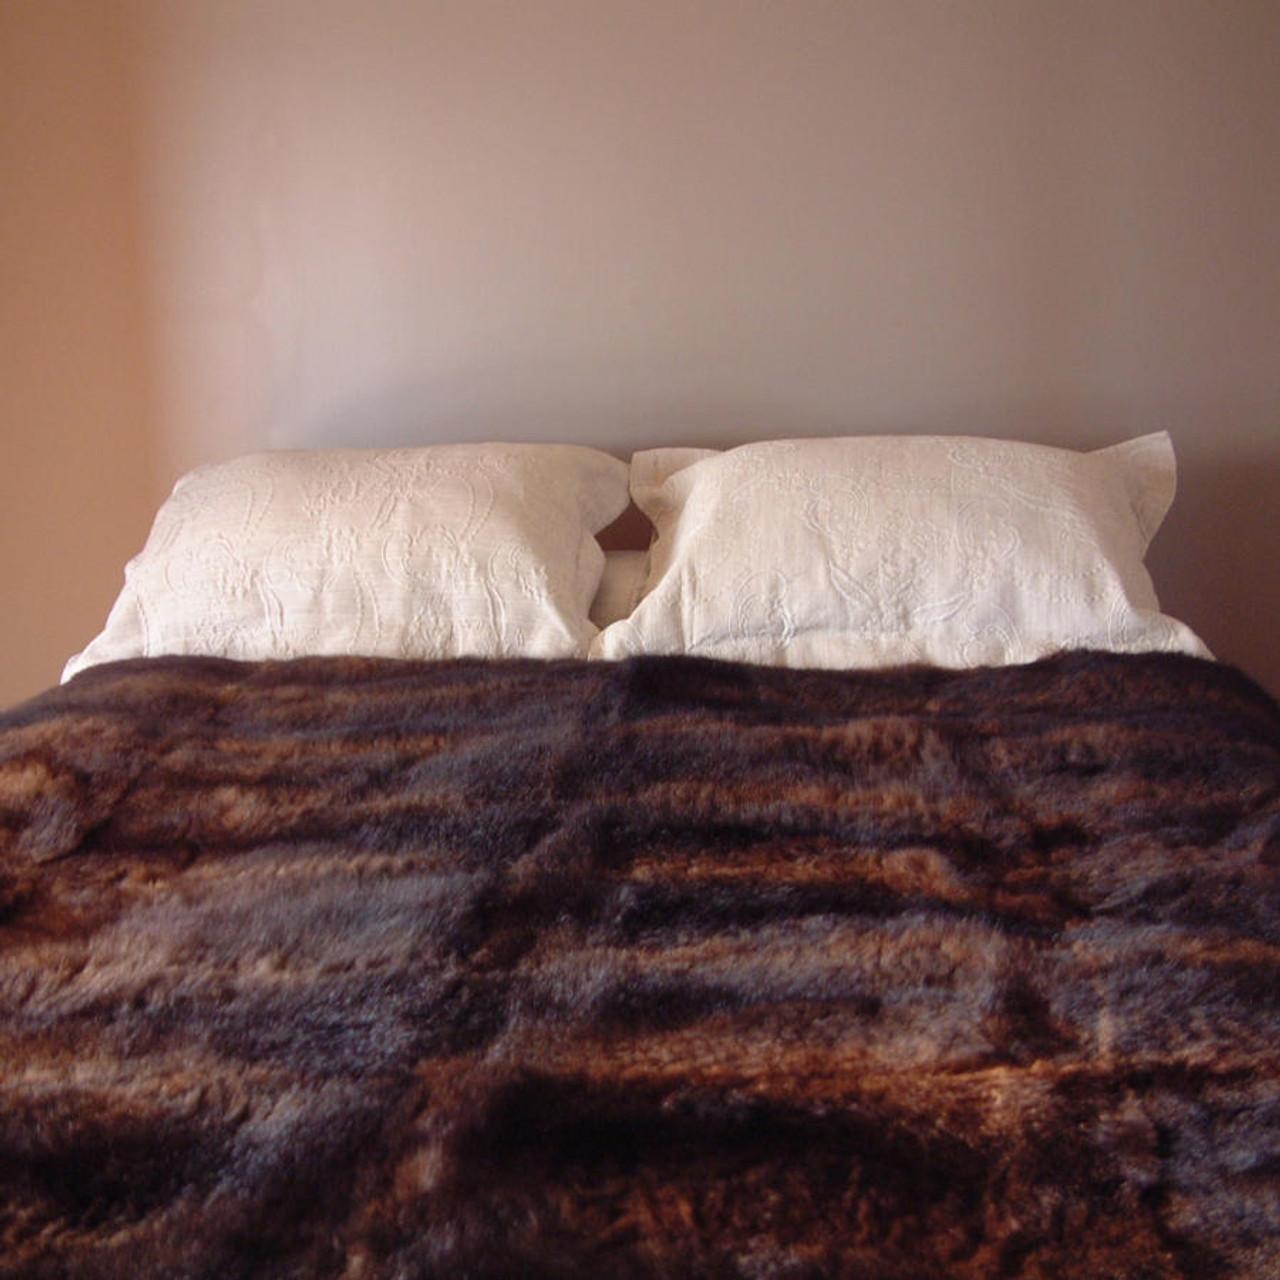 d0a553d13cd Mooneys - 40 Skin   Possum Fur Throw Quilt - The Tin Shed